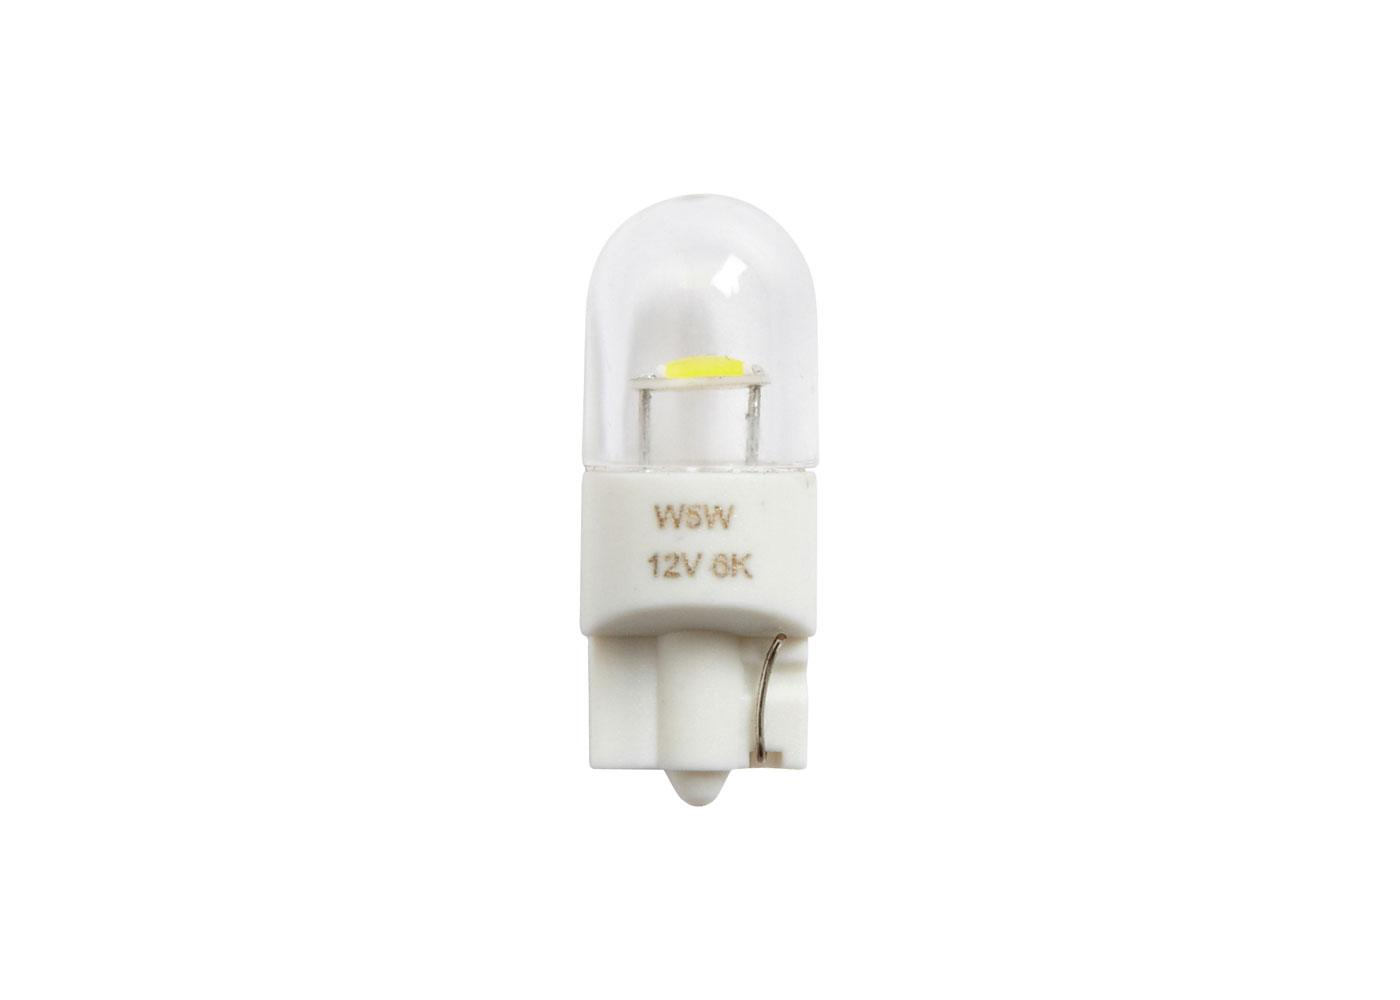 Prisme silver amber indicateur ampoules-spw3501a 2x ring W5W 501